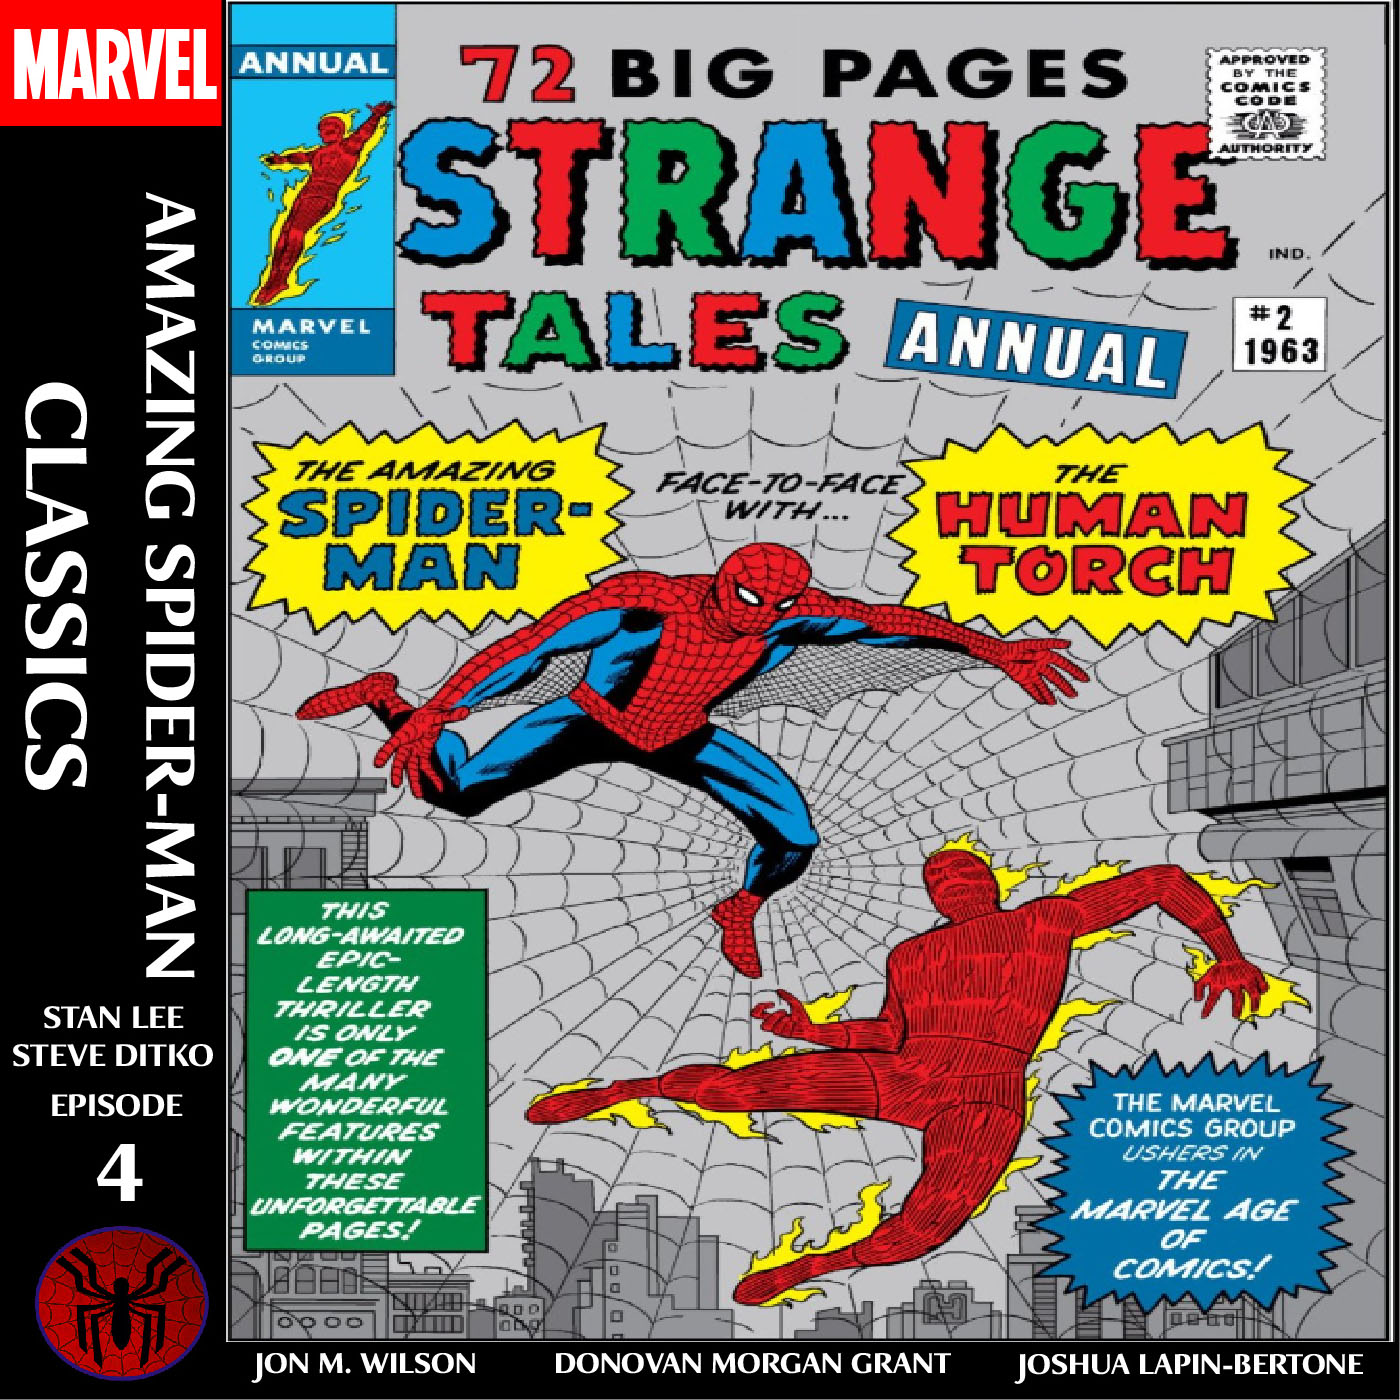 Amazing Spider-Man Classics Episode 4: Strange Tales Annual 2